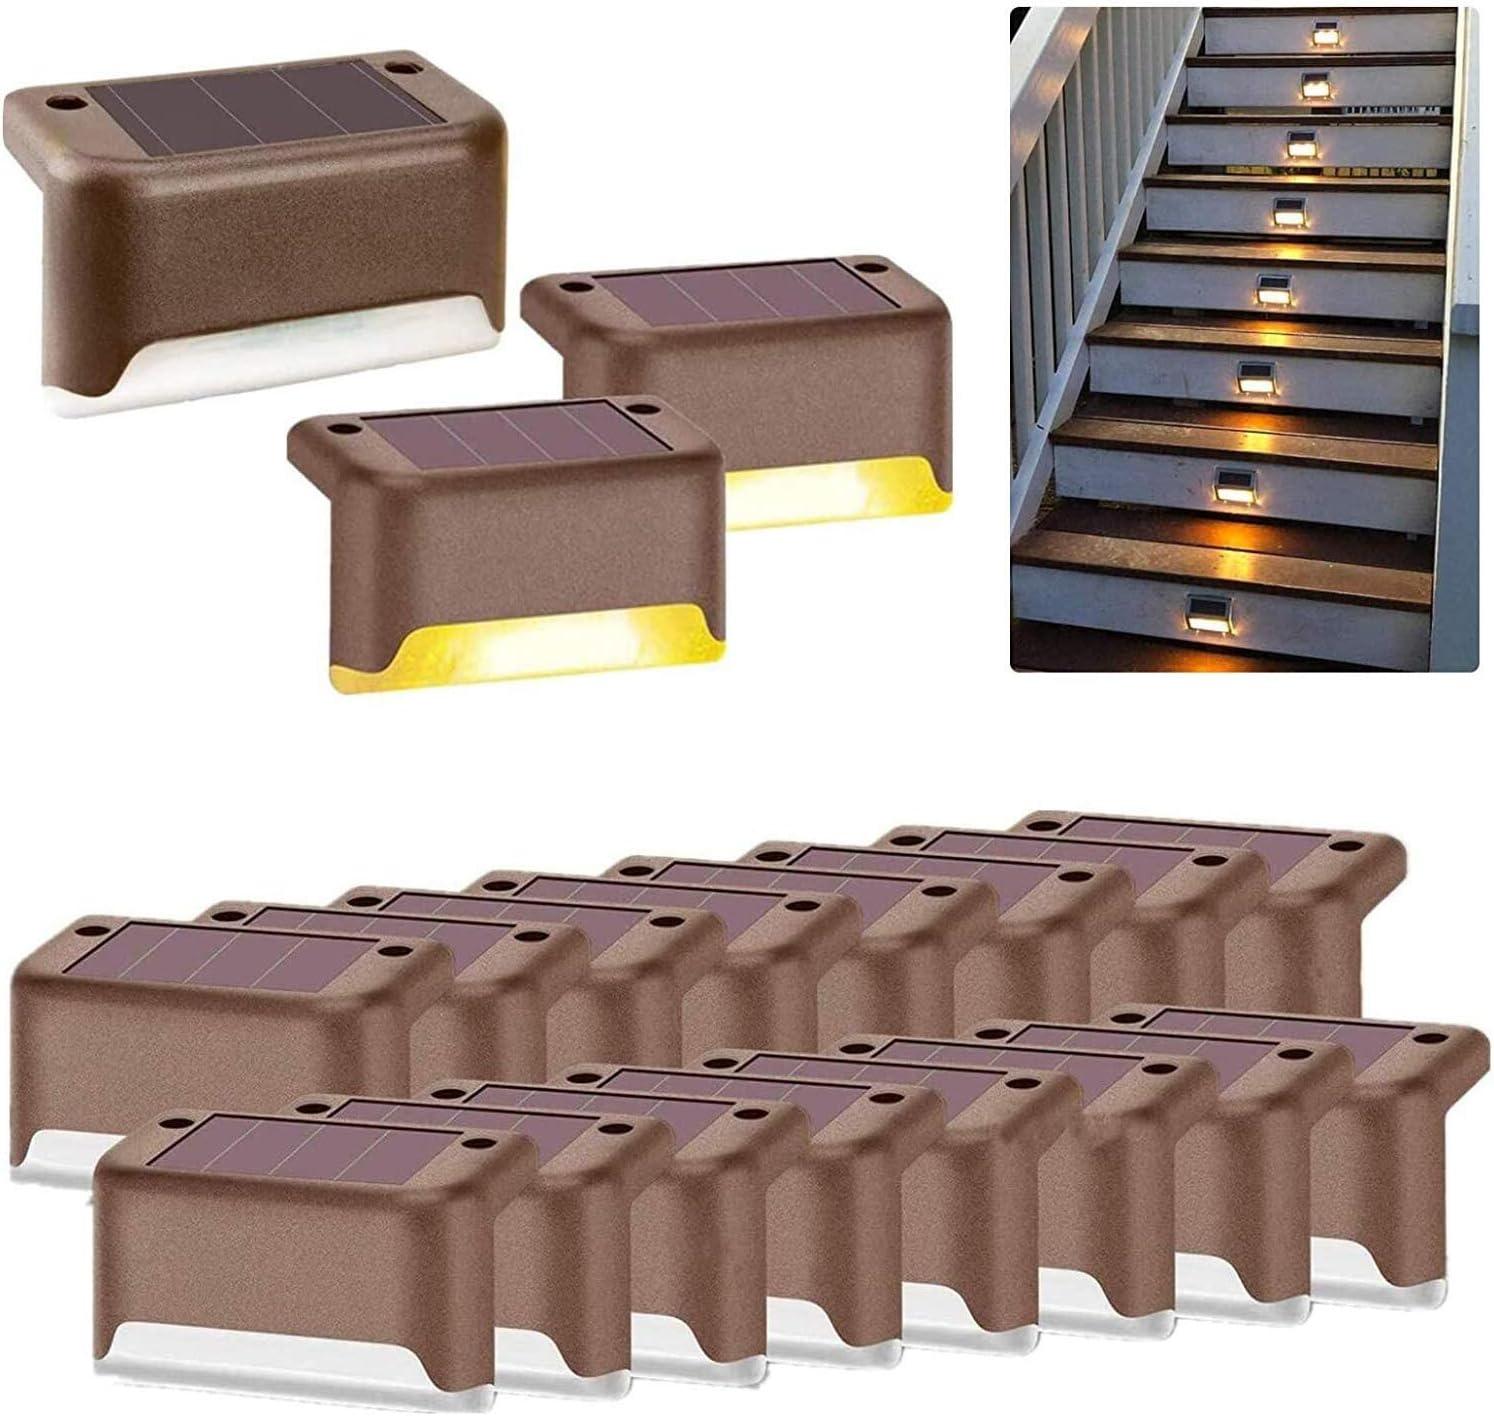 Beinhome Save money Solar Deck Lights Outdoor 16 Pack Waterproo Max 70% OFF Step